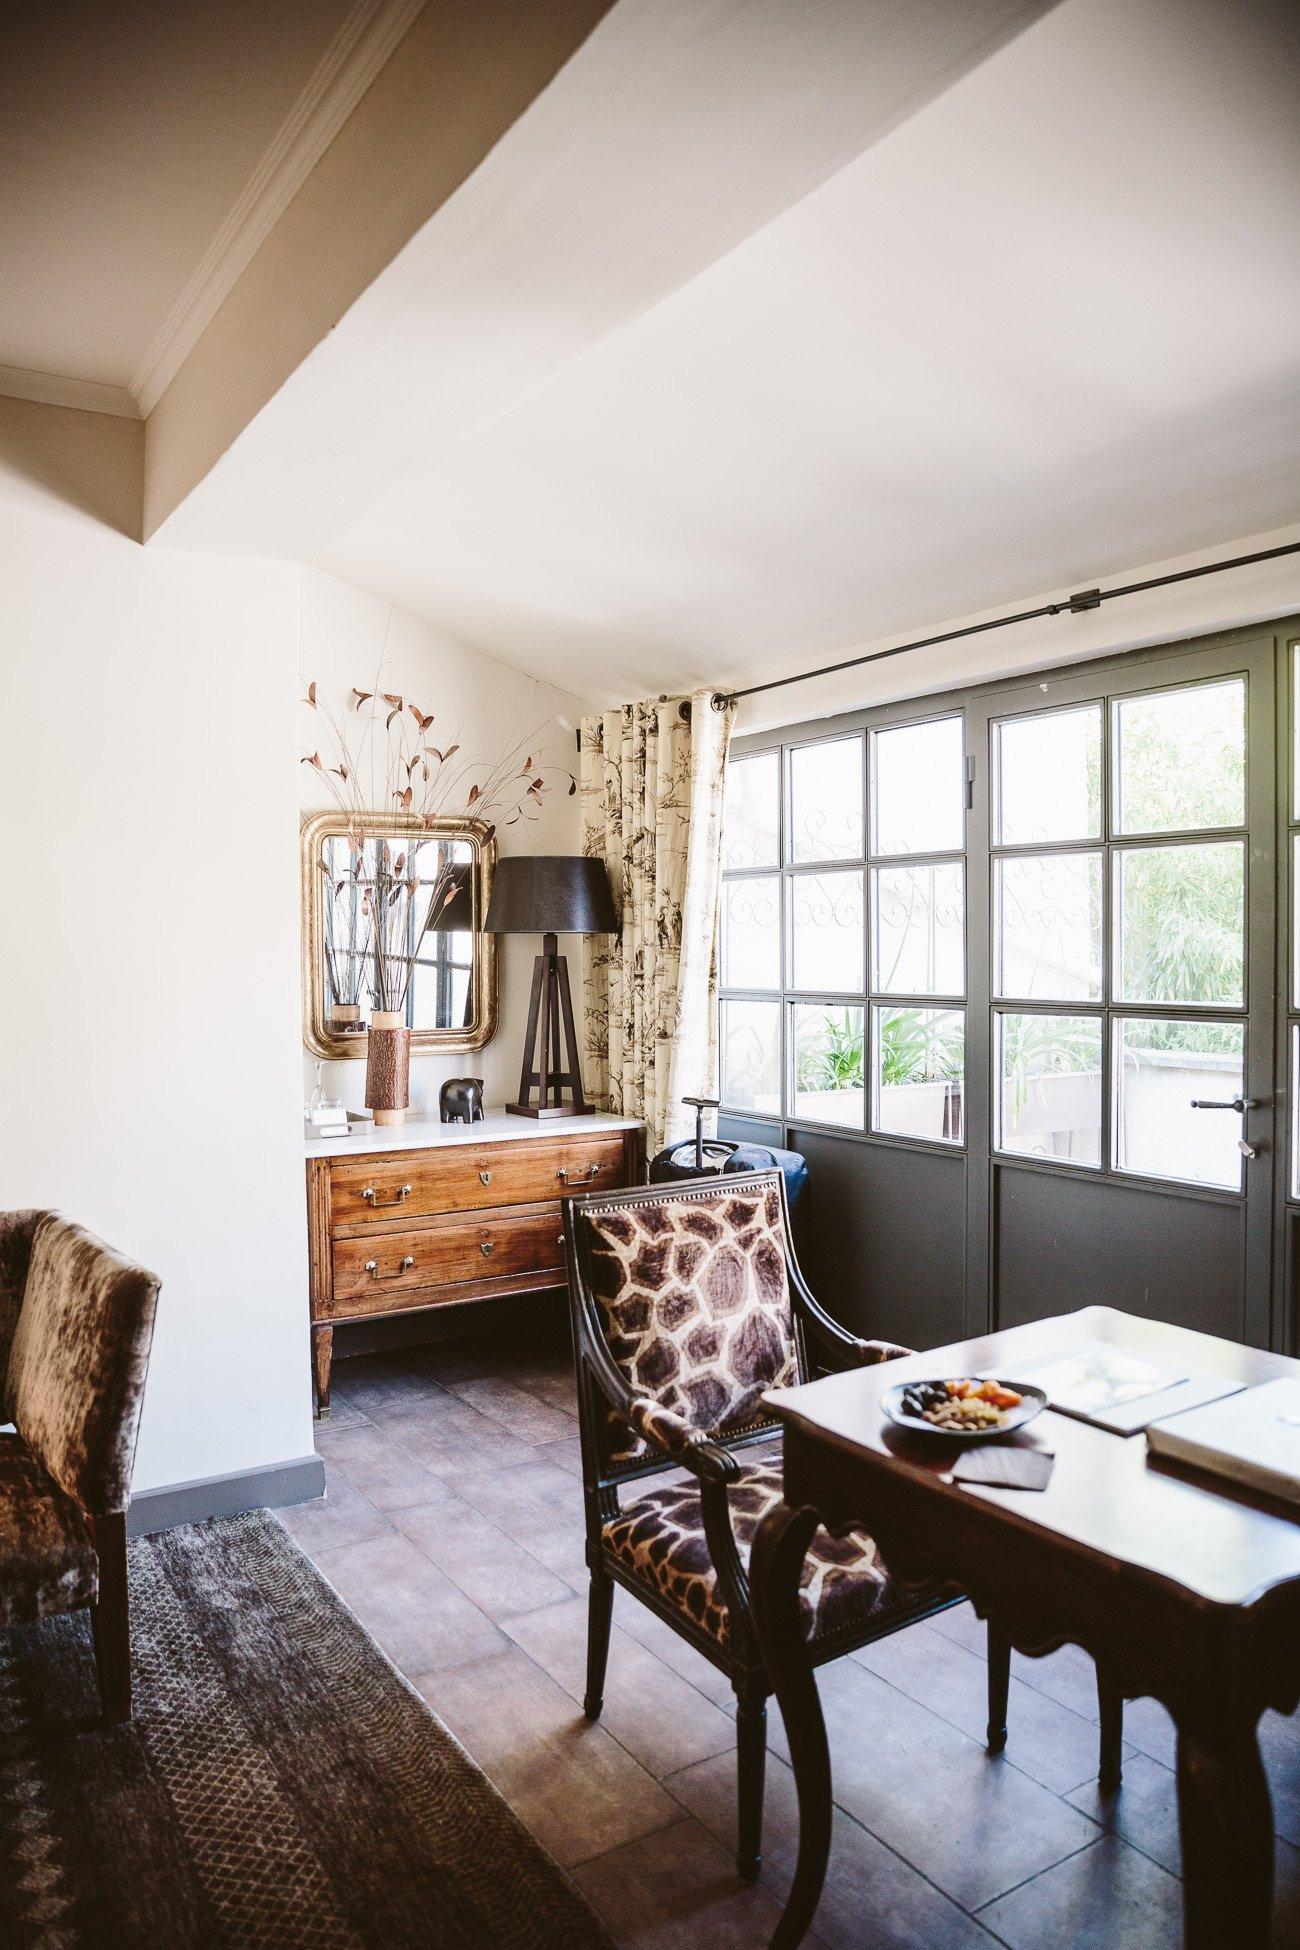 Room at Baumanière Hotel